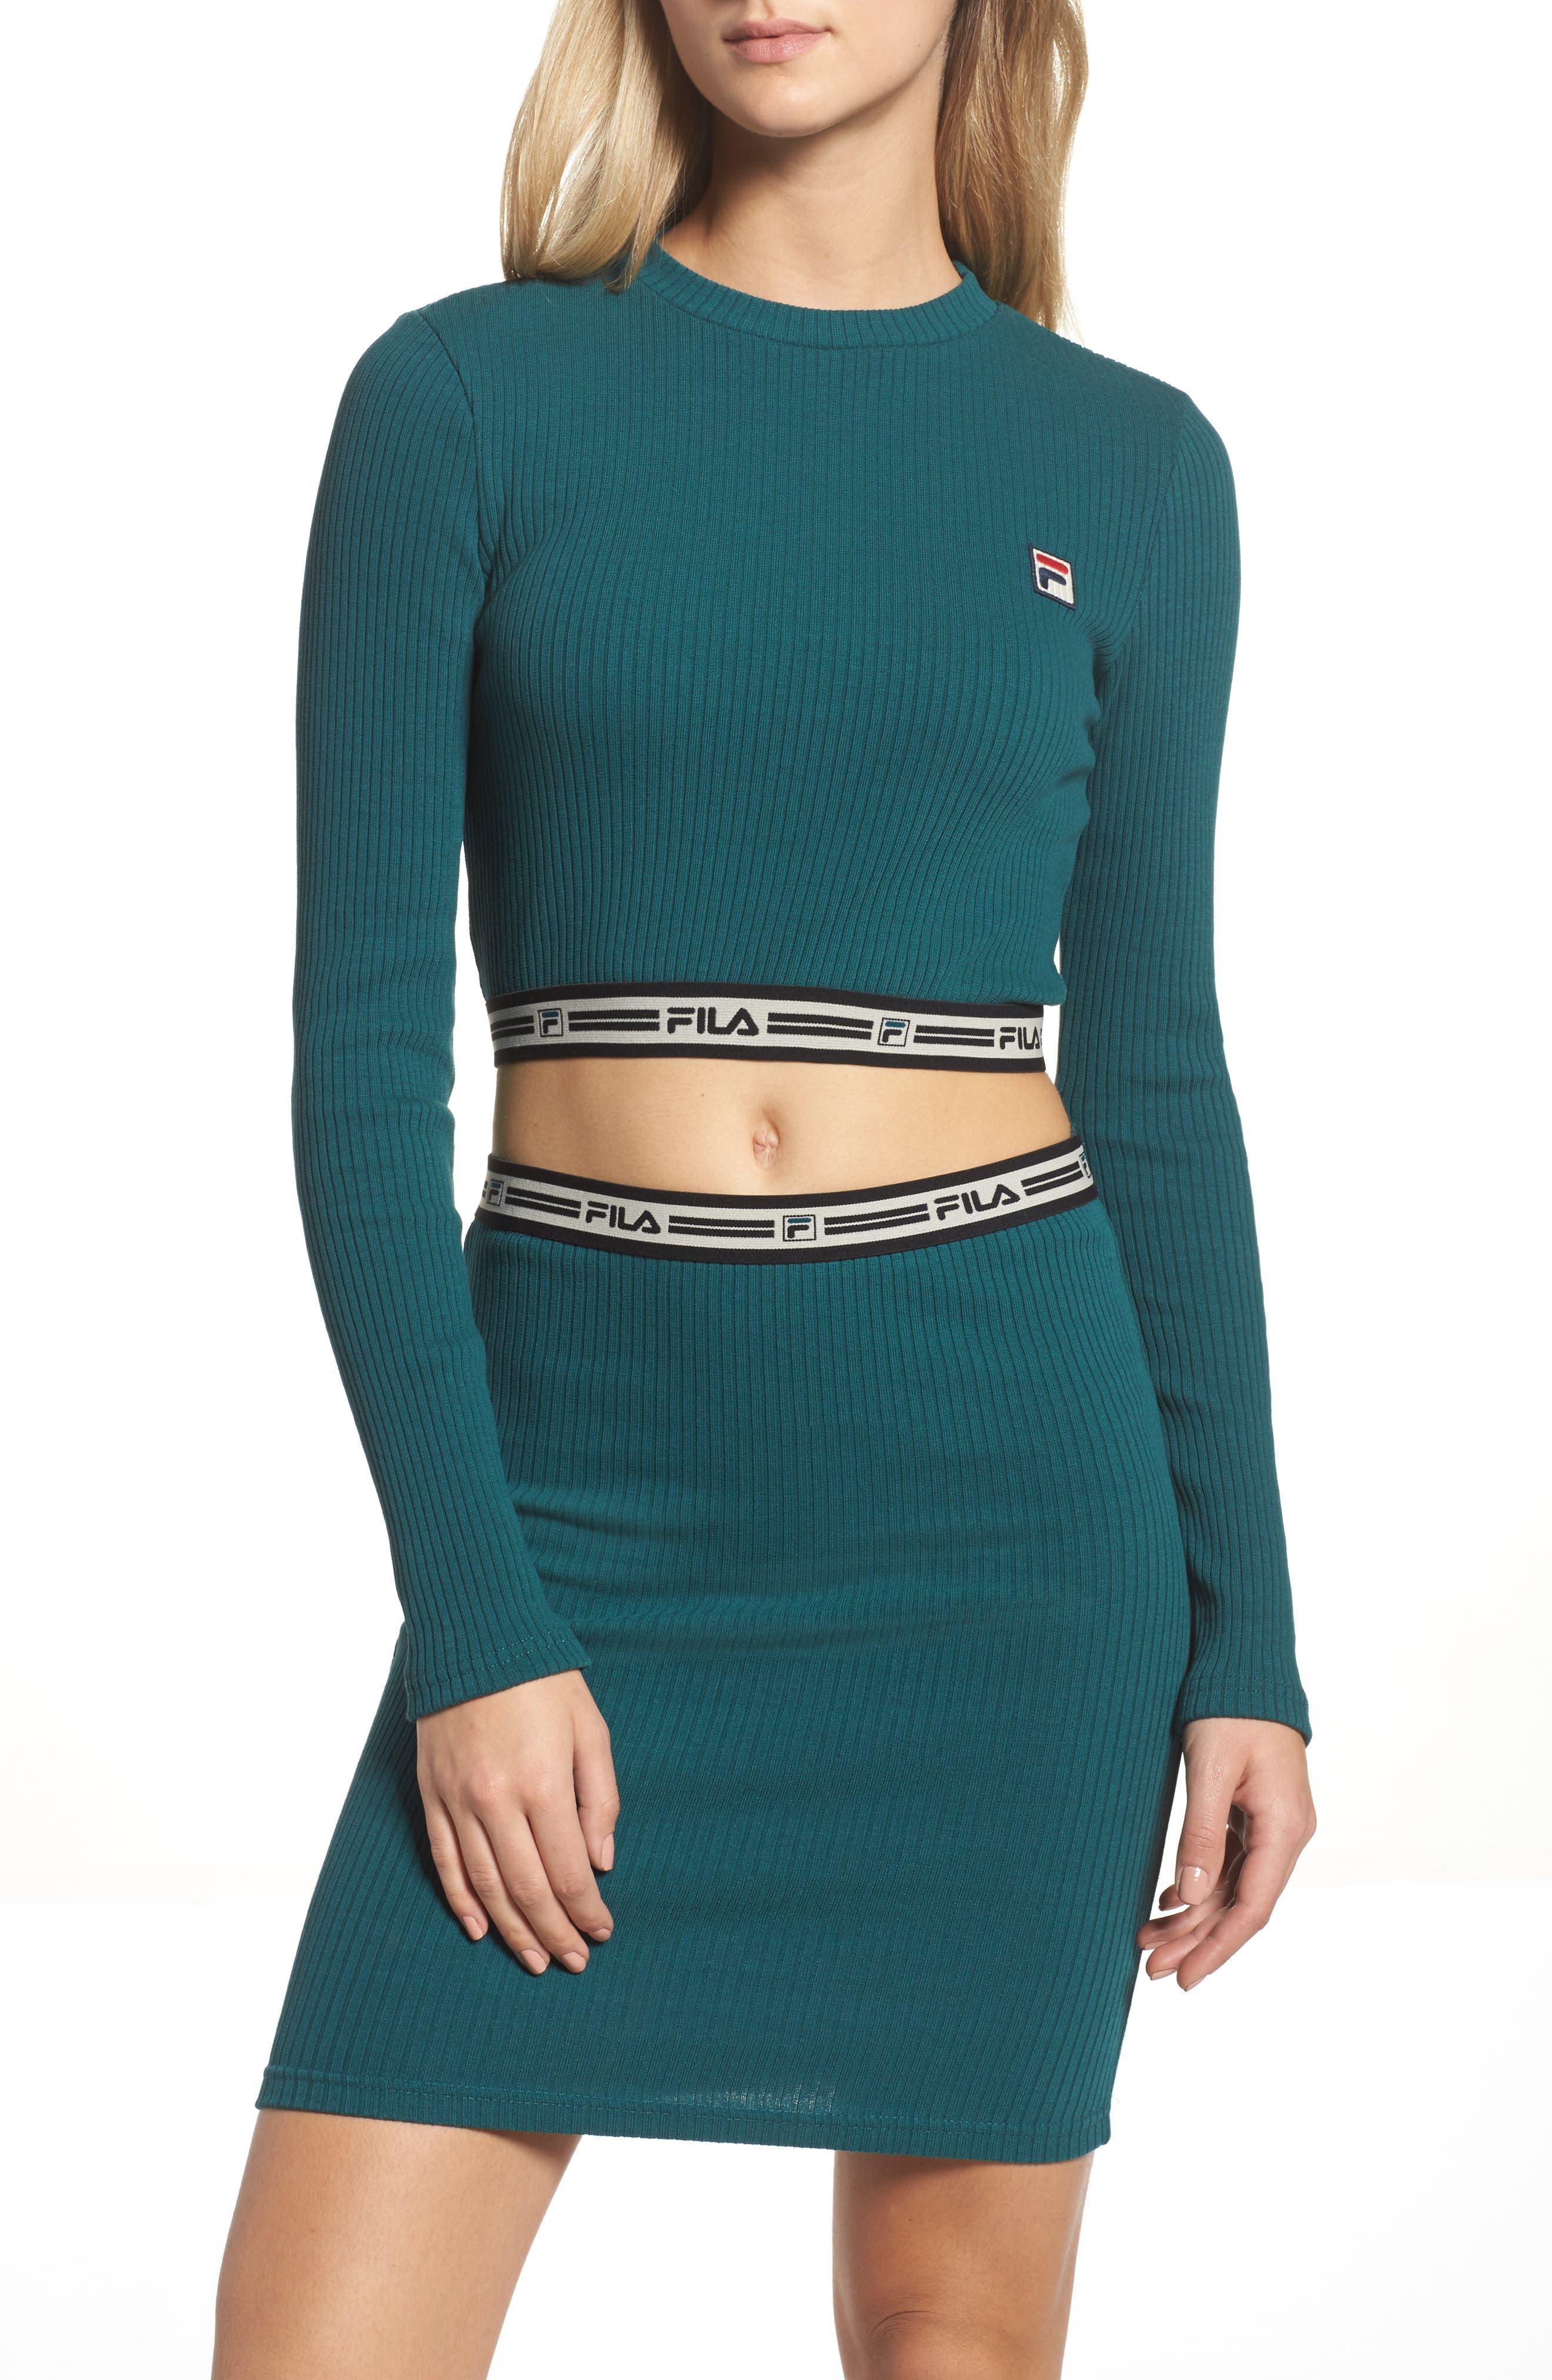 Colleen Long Sleeve Crop Top,                         Main,                         color, 440